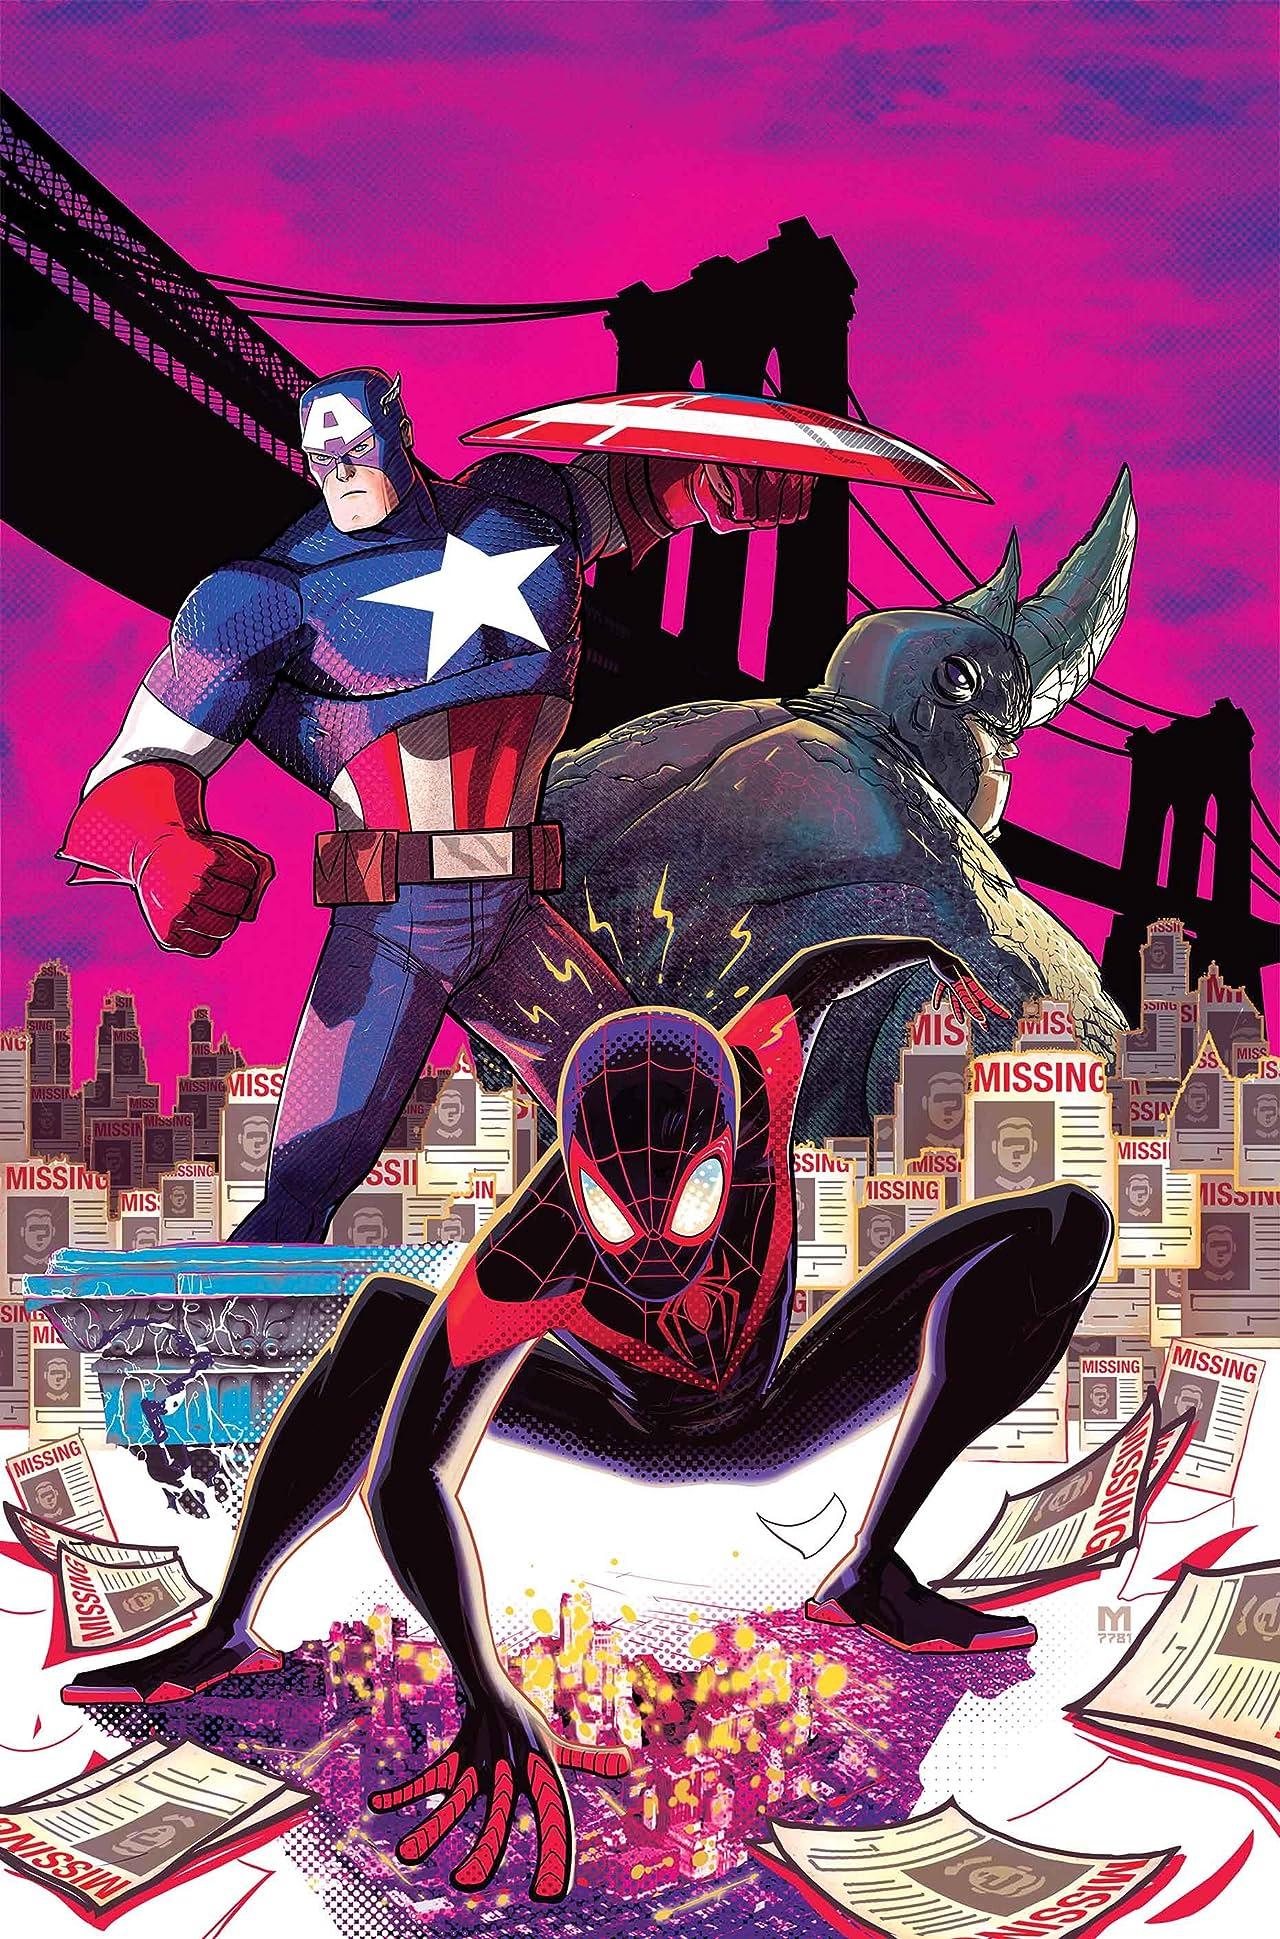 Miles Morales: Spider-Man (2018-) #3